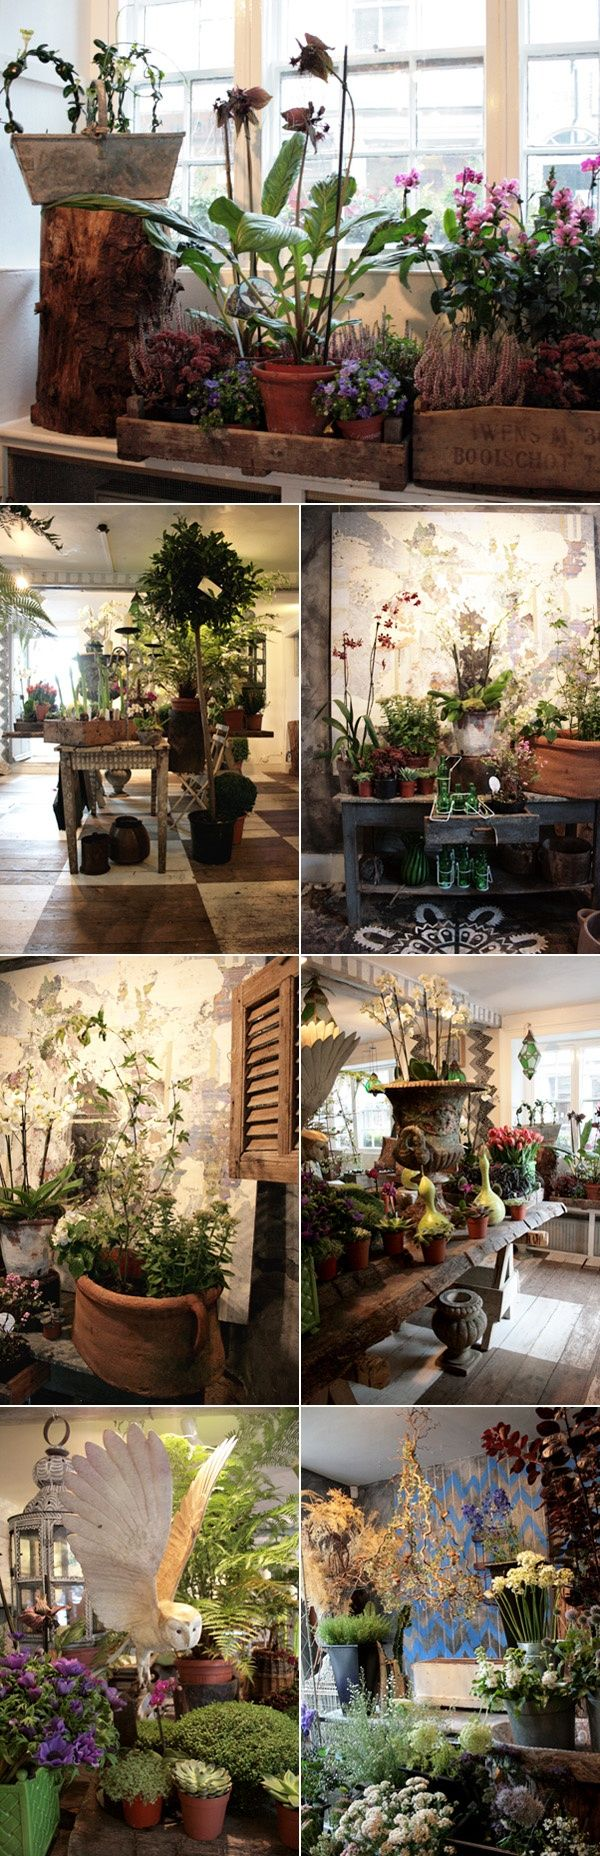 Twig florist shop in Tetbury, UK